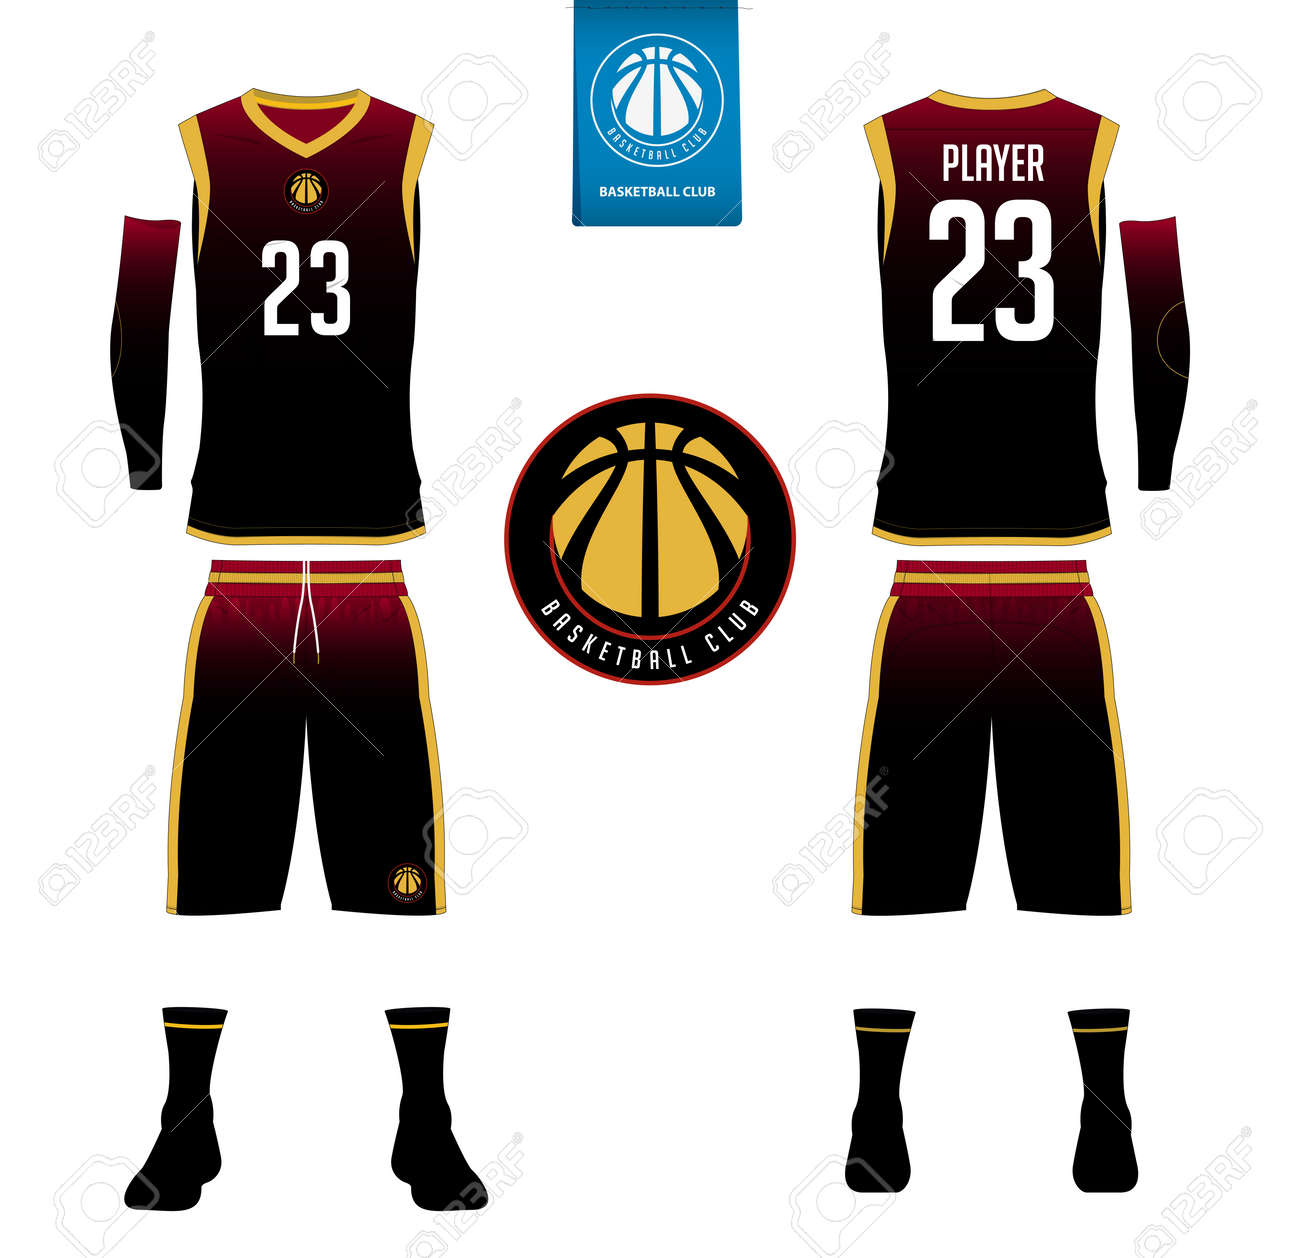 191c68851 Basketball Jersey